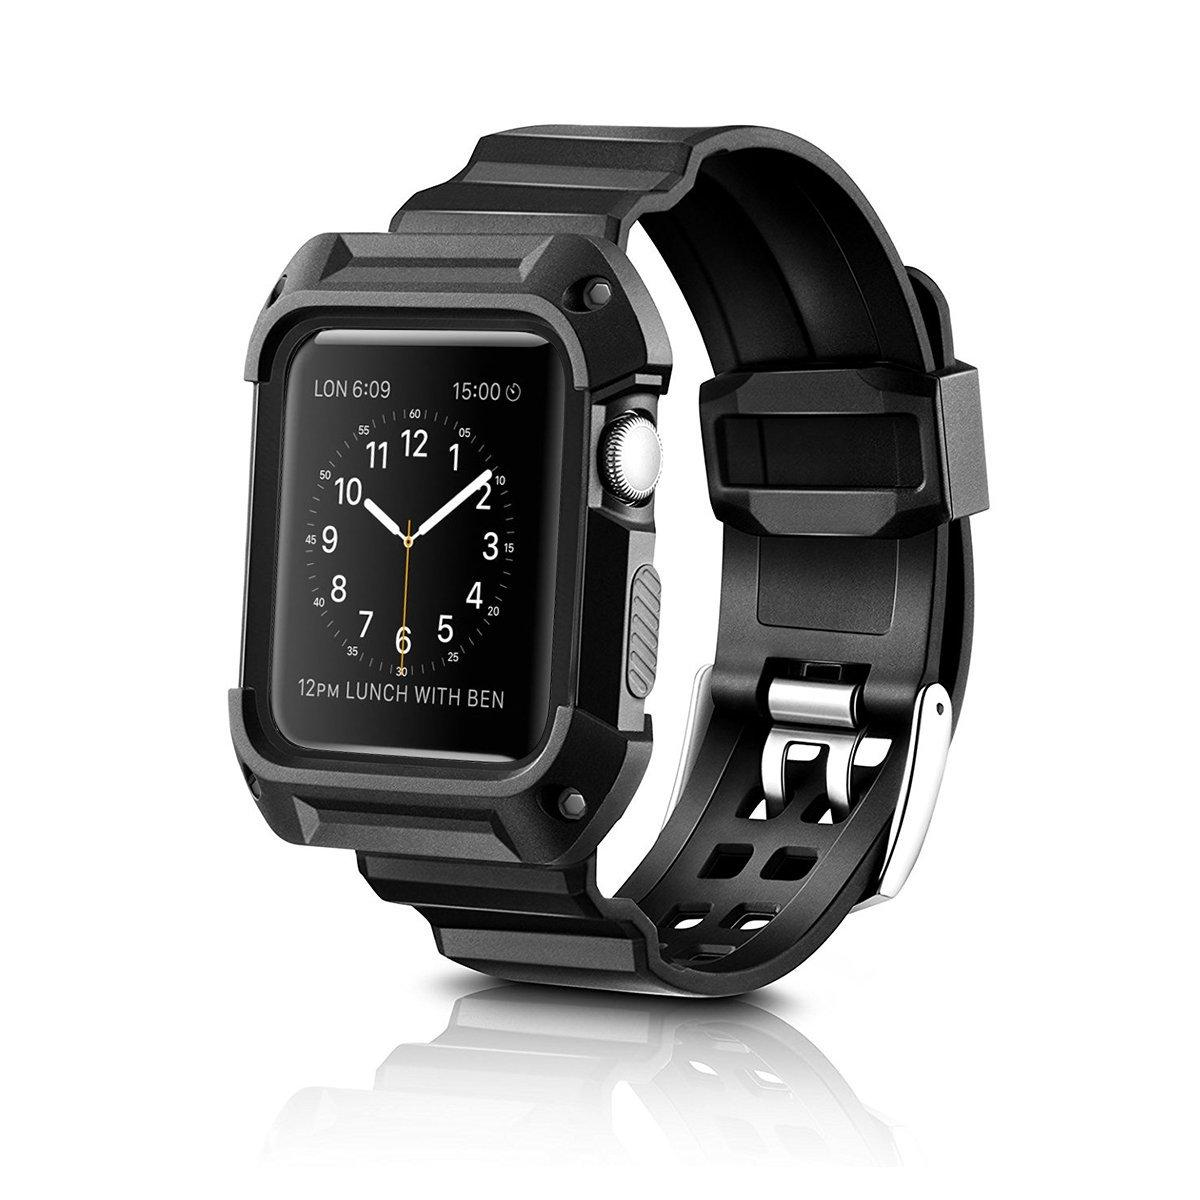 Cheap Watch Band G Shock, find Watch Band G Shock deals on